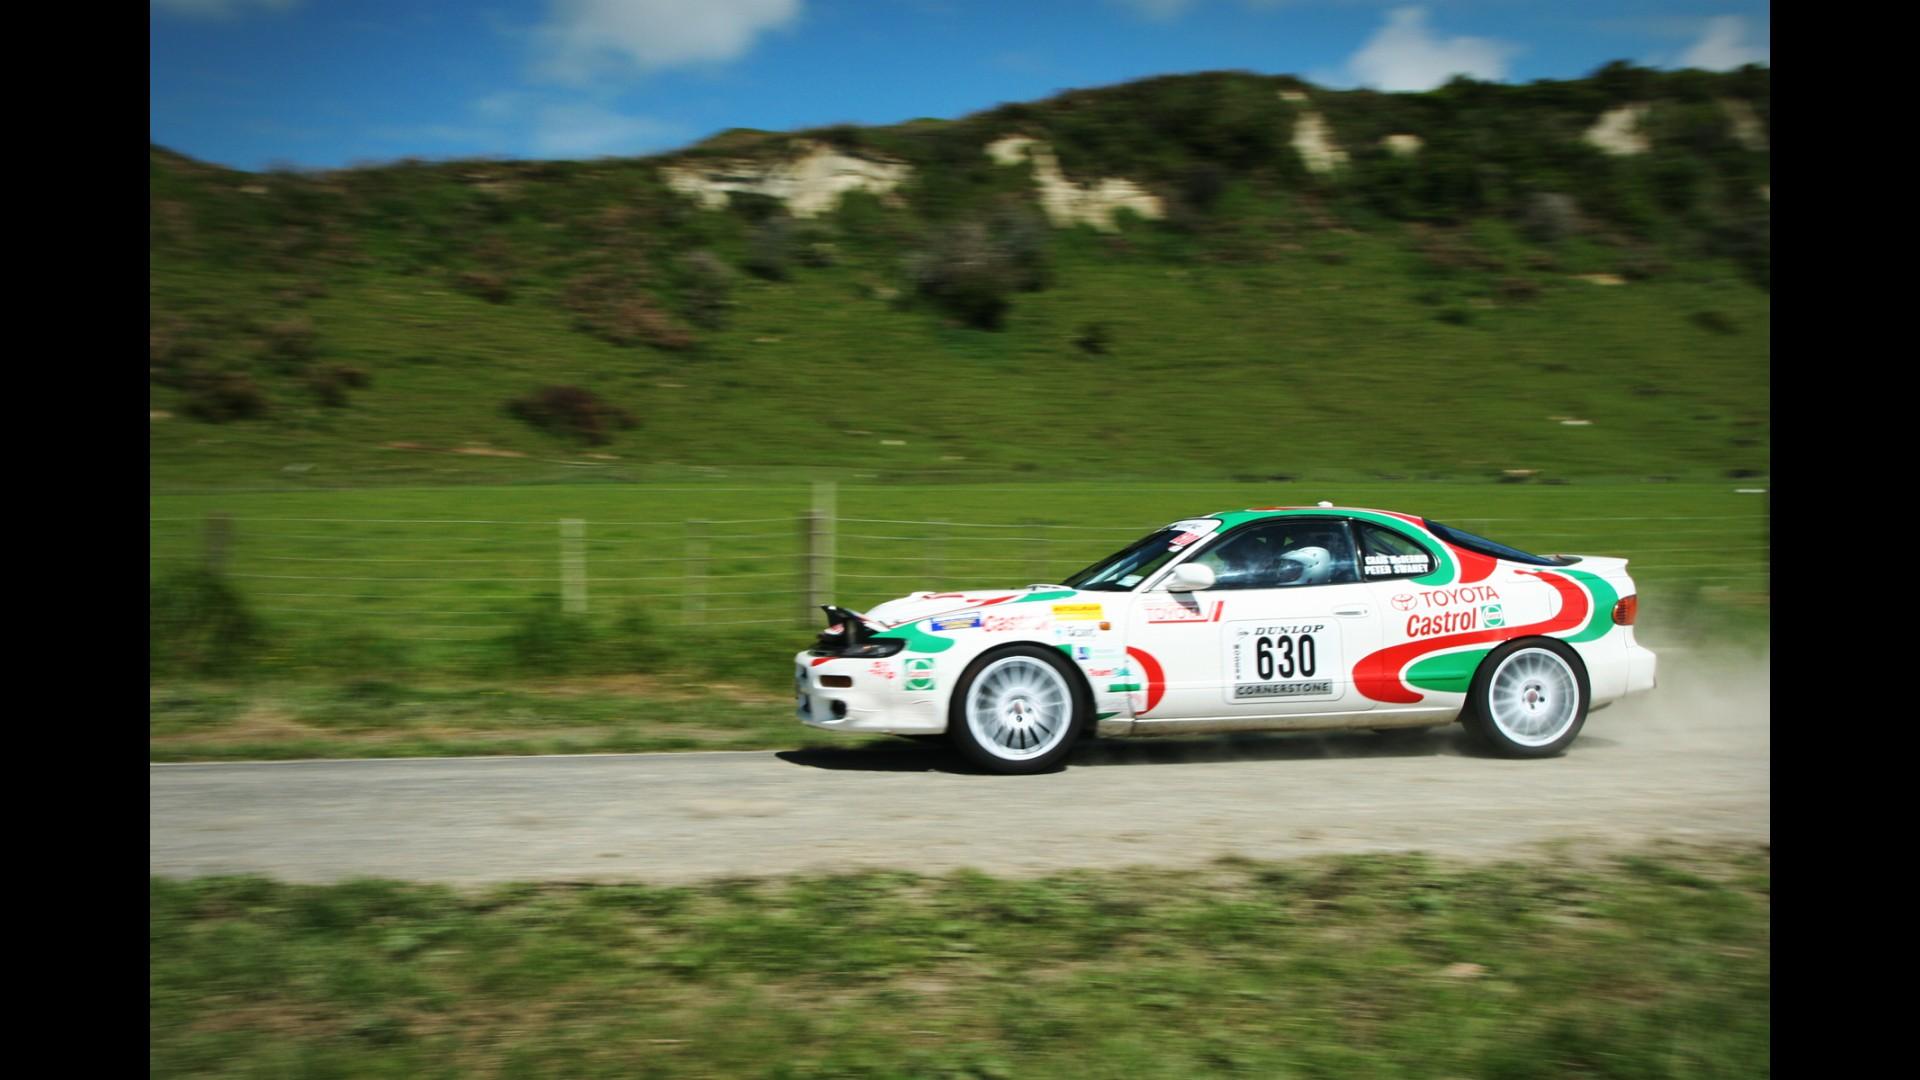 Toyota Celica GT4